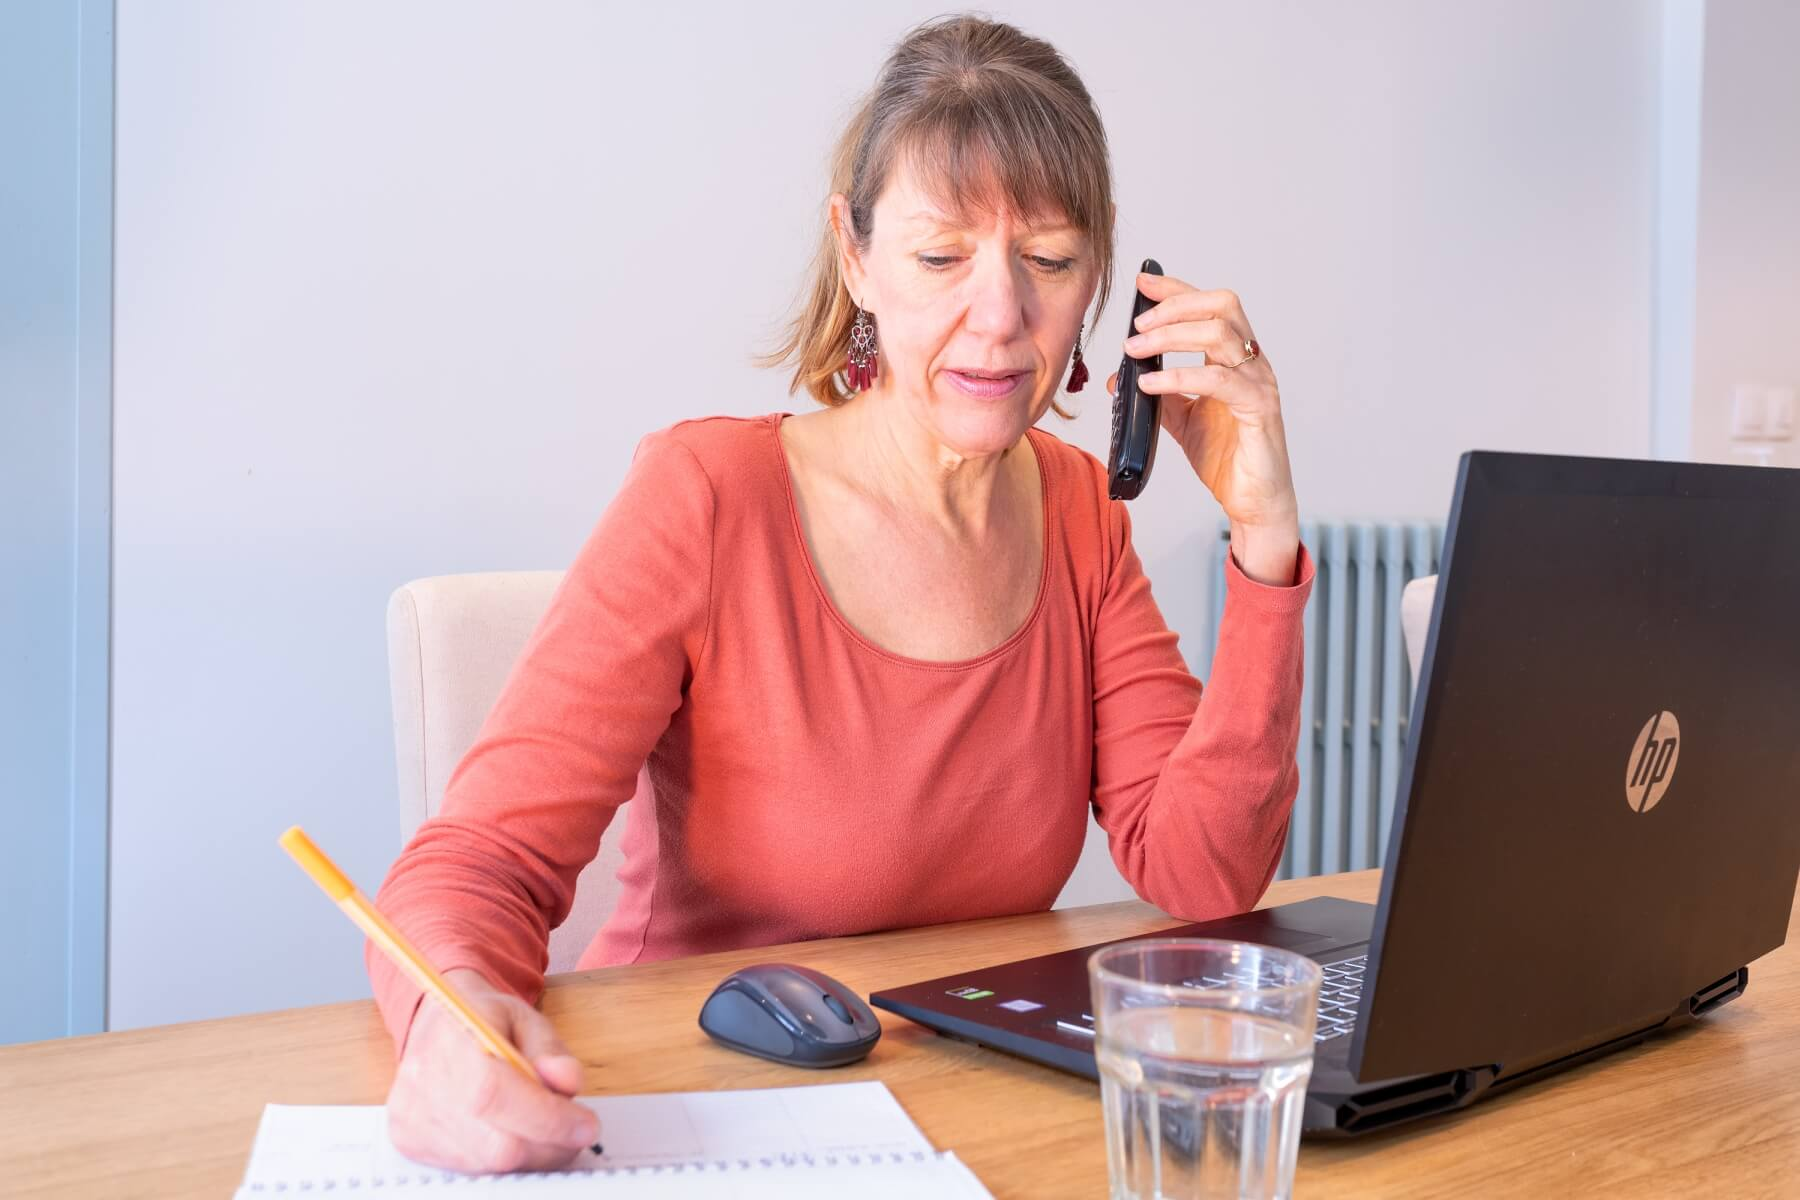 Margriet aan telefoon achter laptop